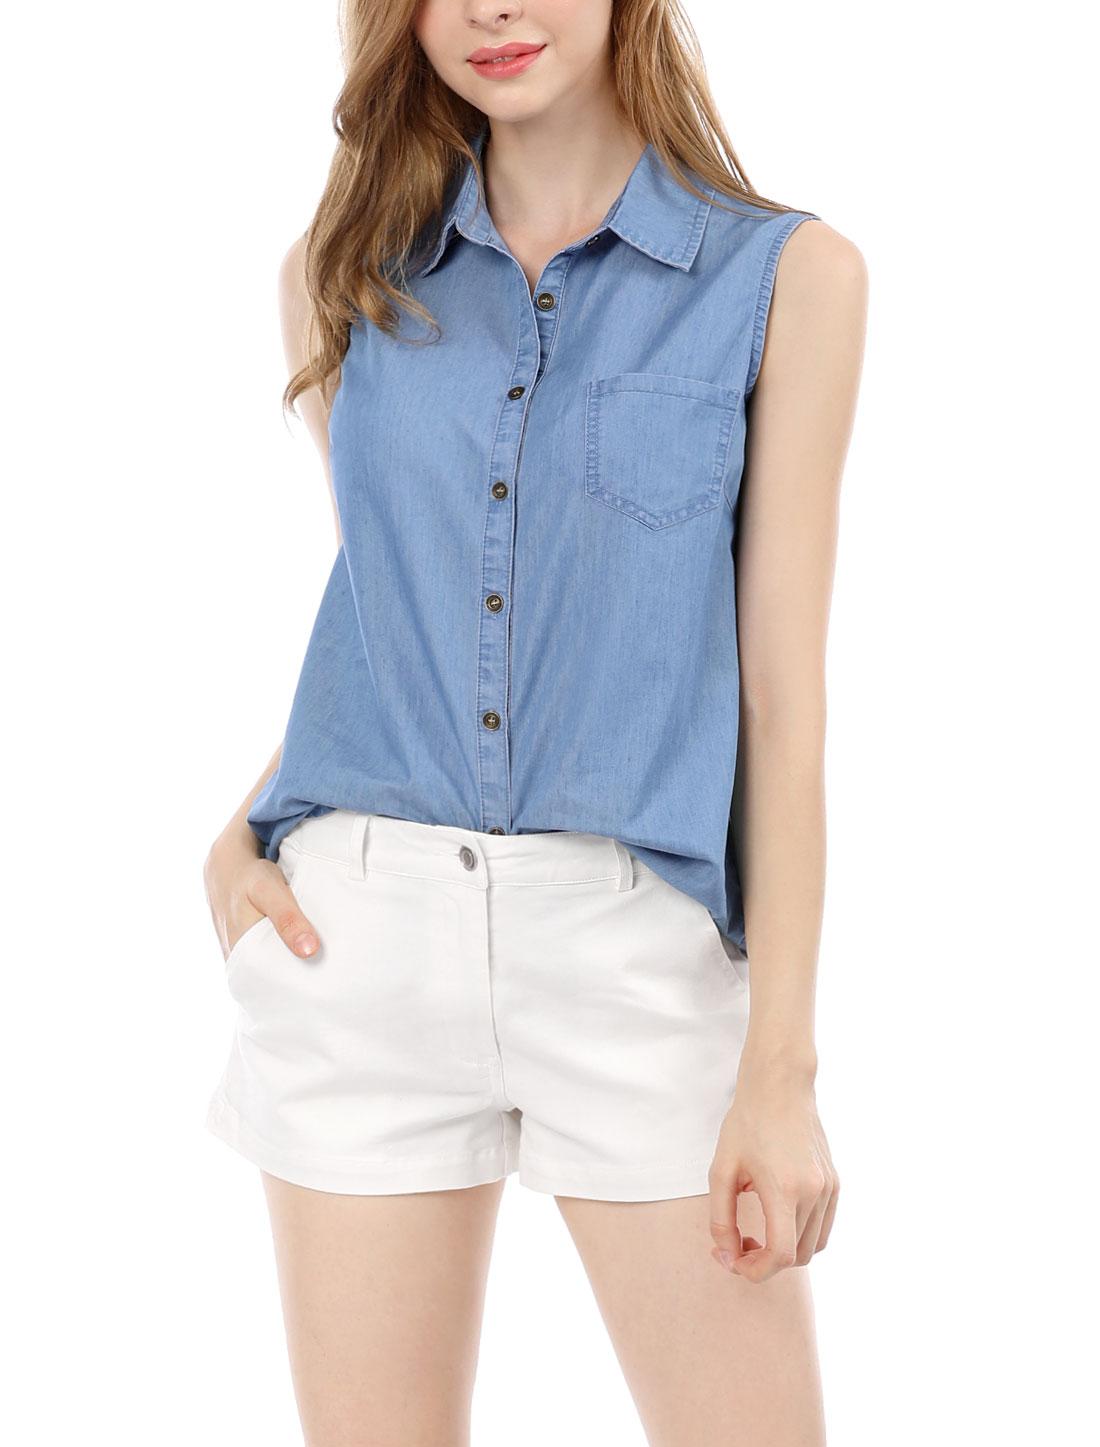 Allegra K Women Single Breasted Collar Sleeveless Shirt Blue XL